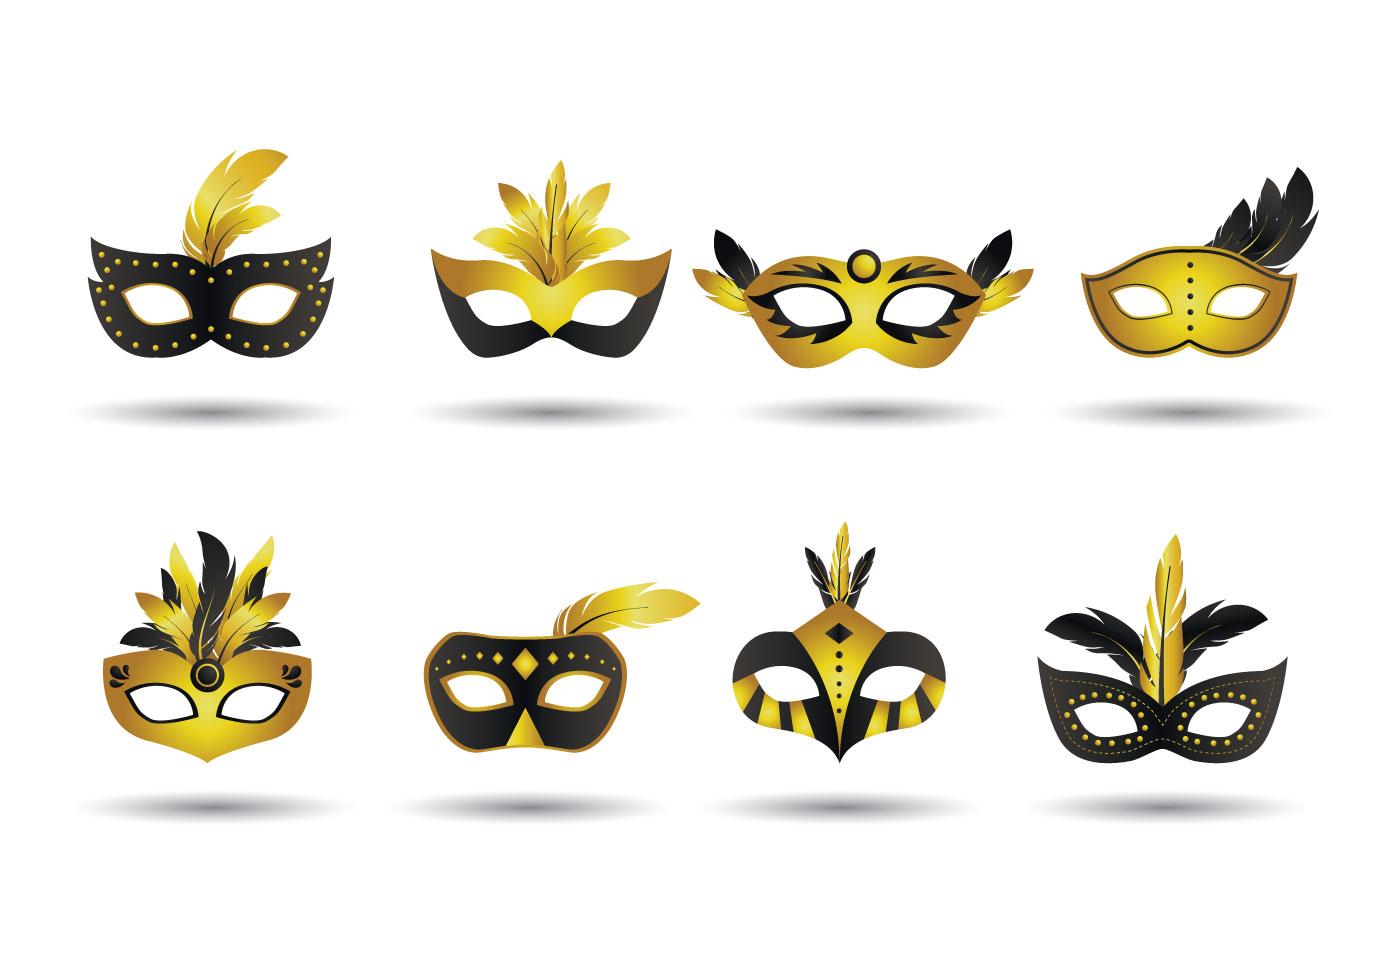 Masquerade Mask Vector - Download Free Vectors, Clipart ...  Masquerade Mask Vector